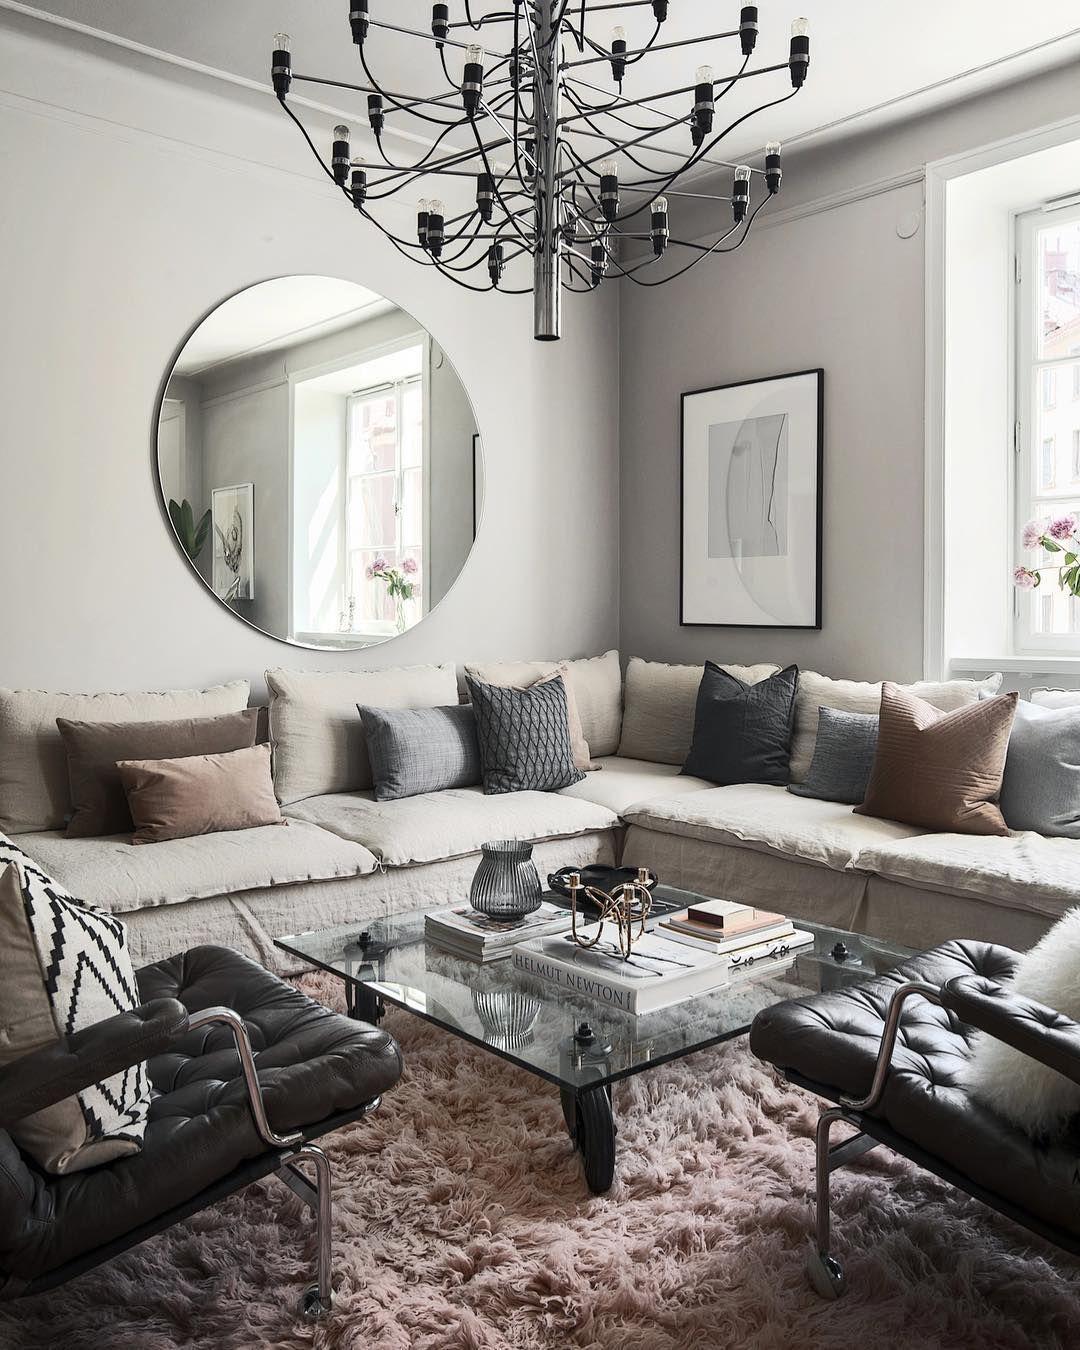 😍 Foto @kronfoto Styling @dreamdesign.sthlm | Living Room in 2019 ...